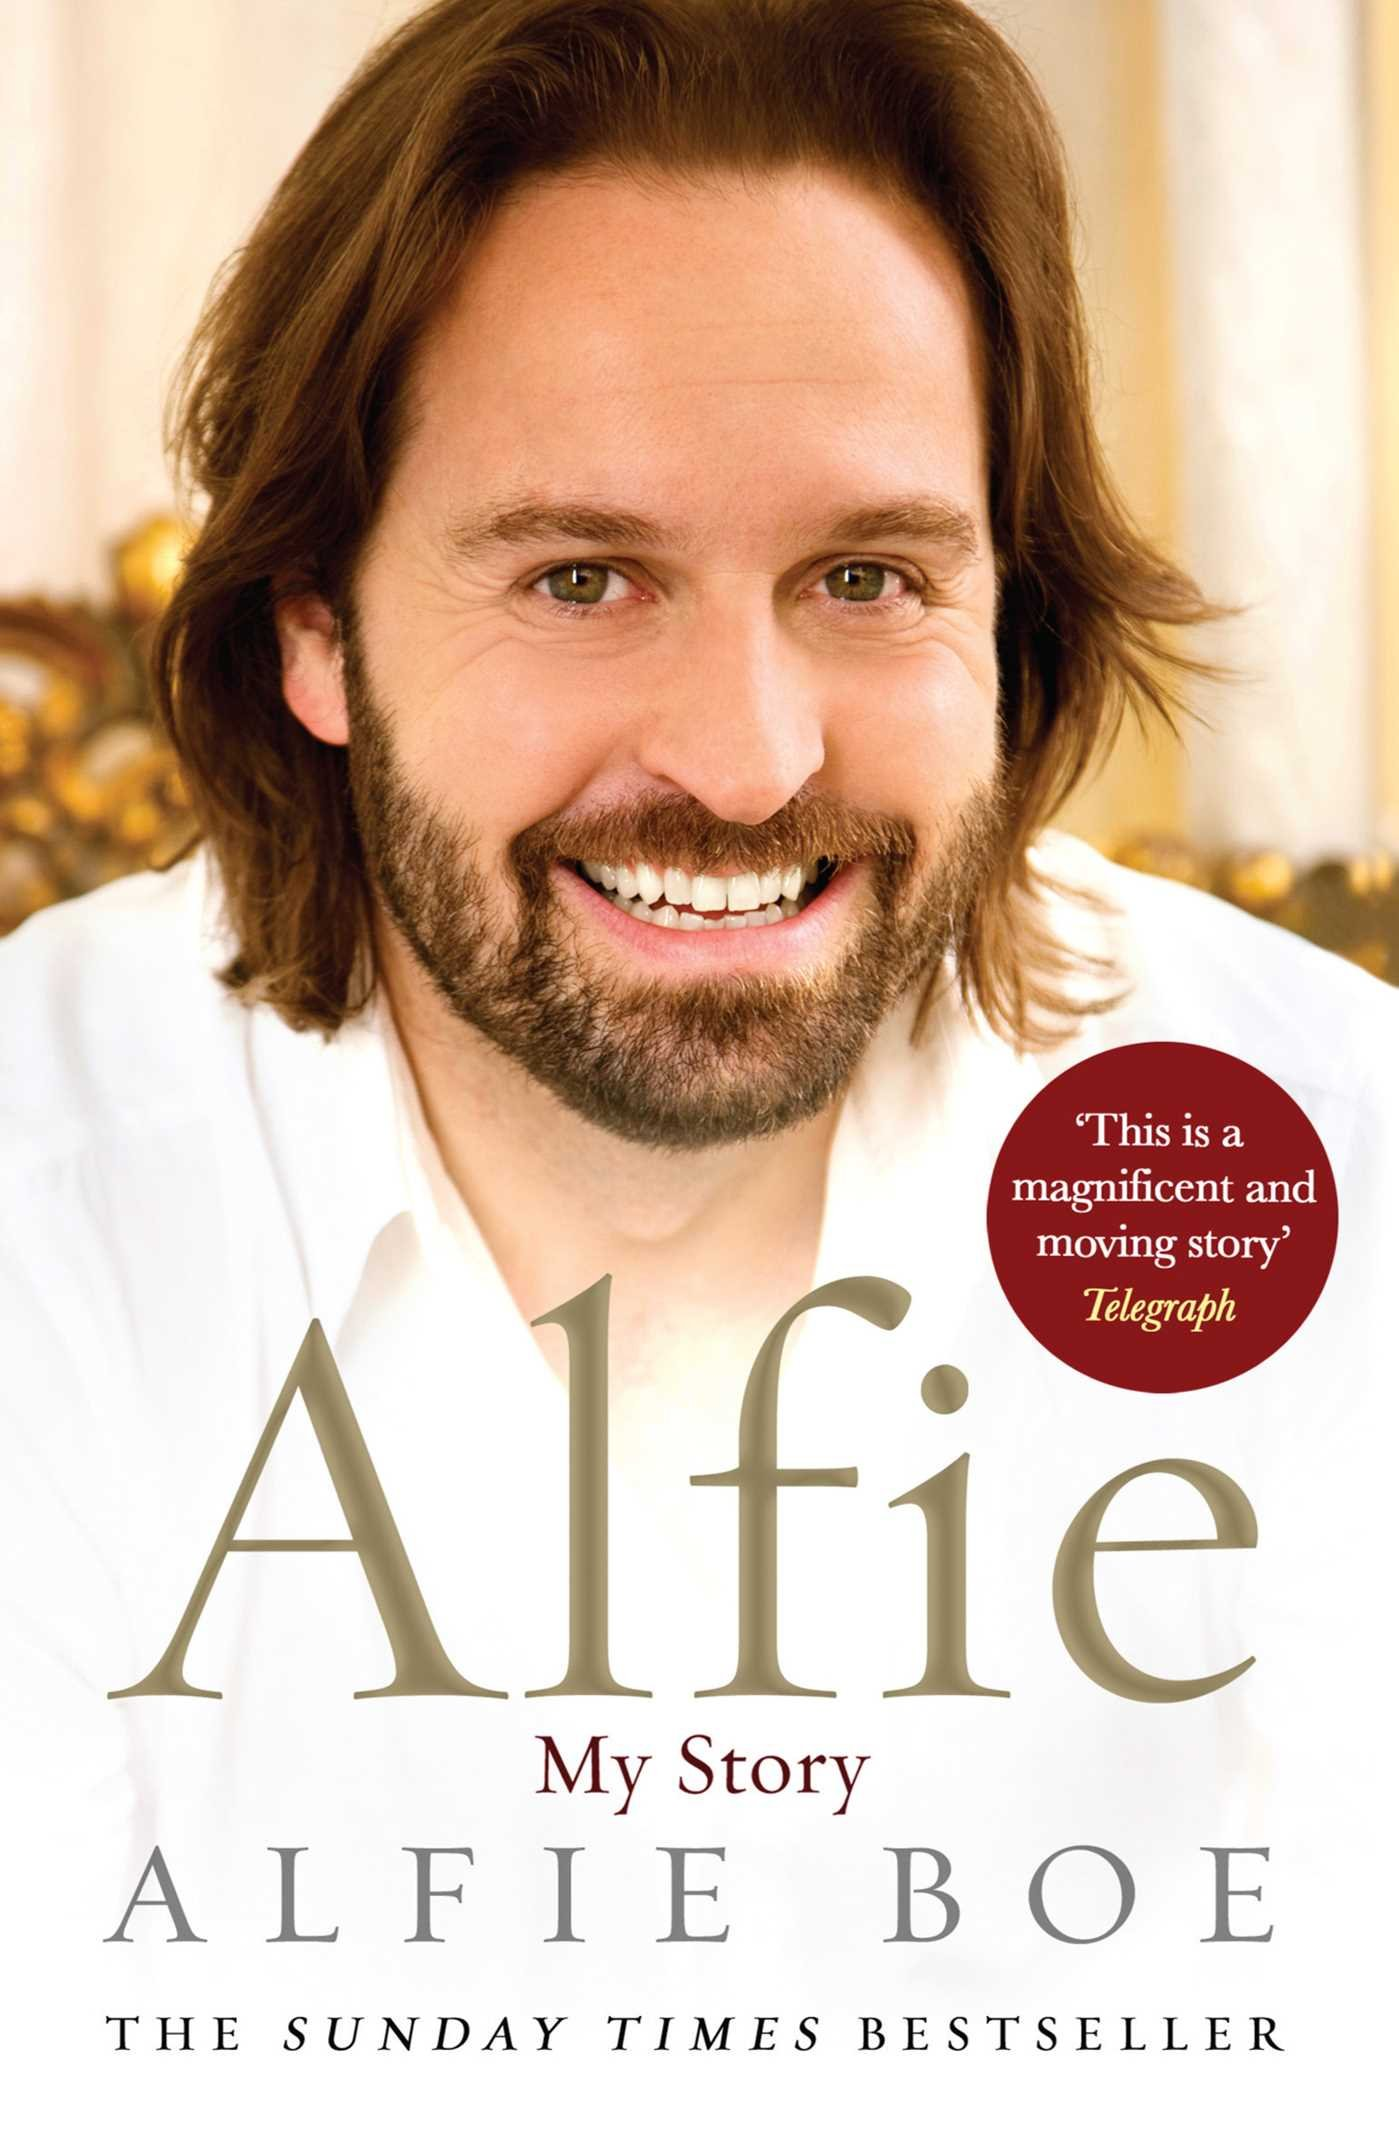 Alfie The Bring Him Home Tour DVD Amazon Alfie Boe